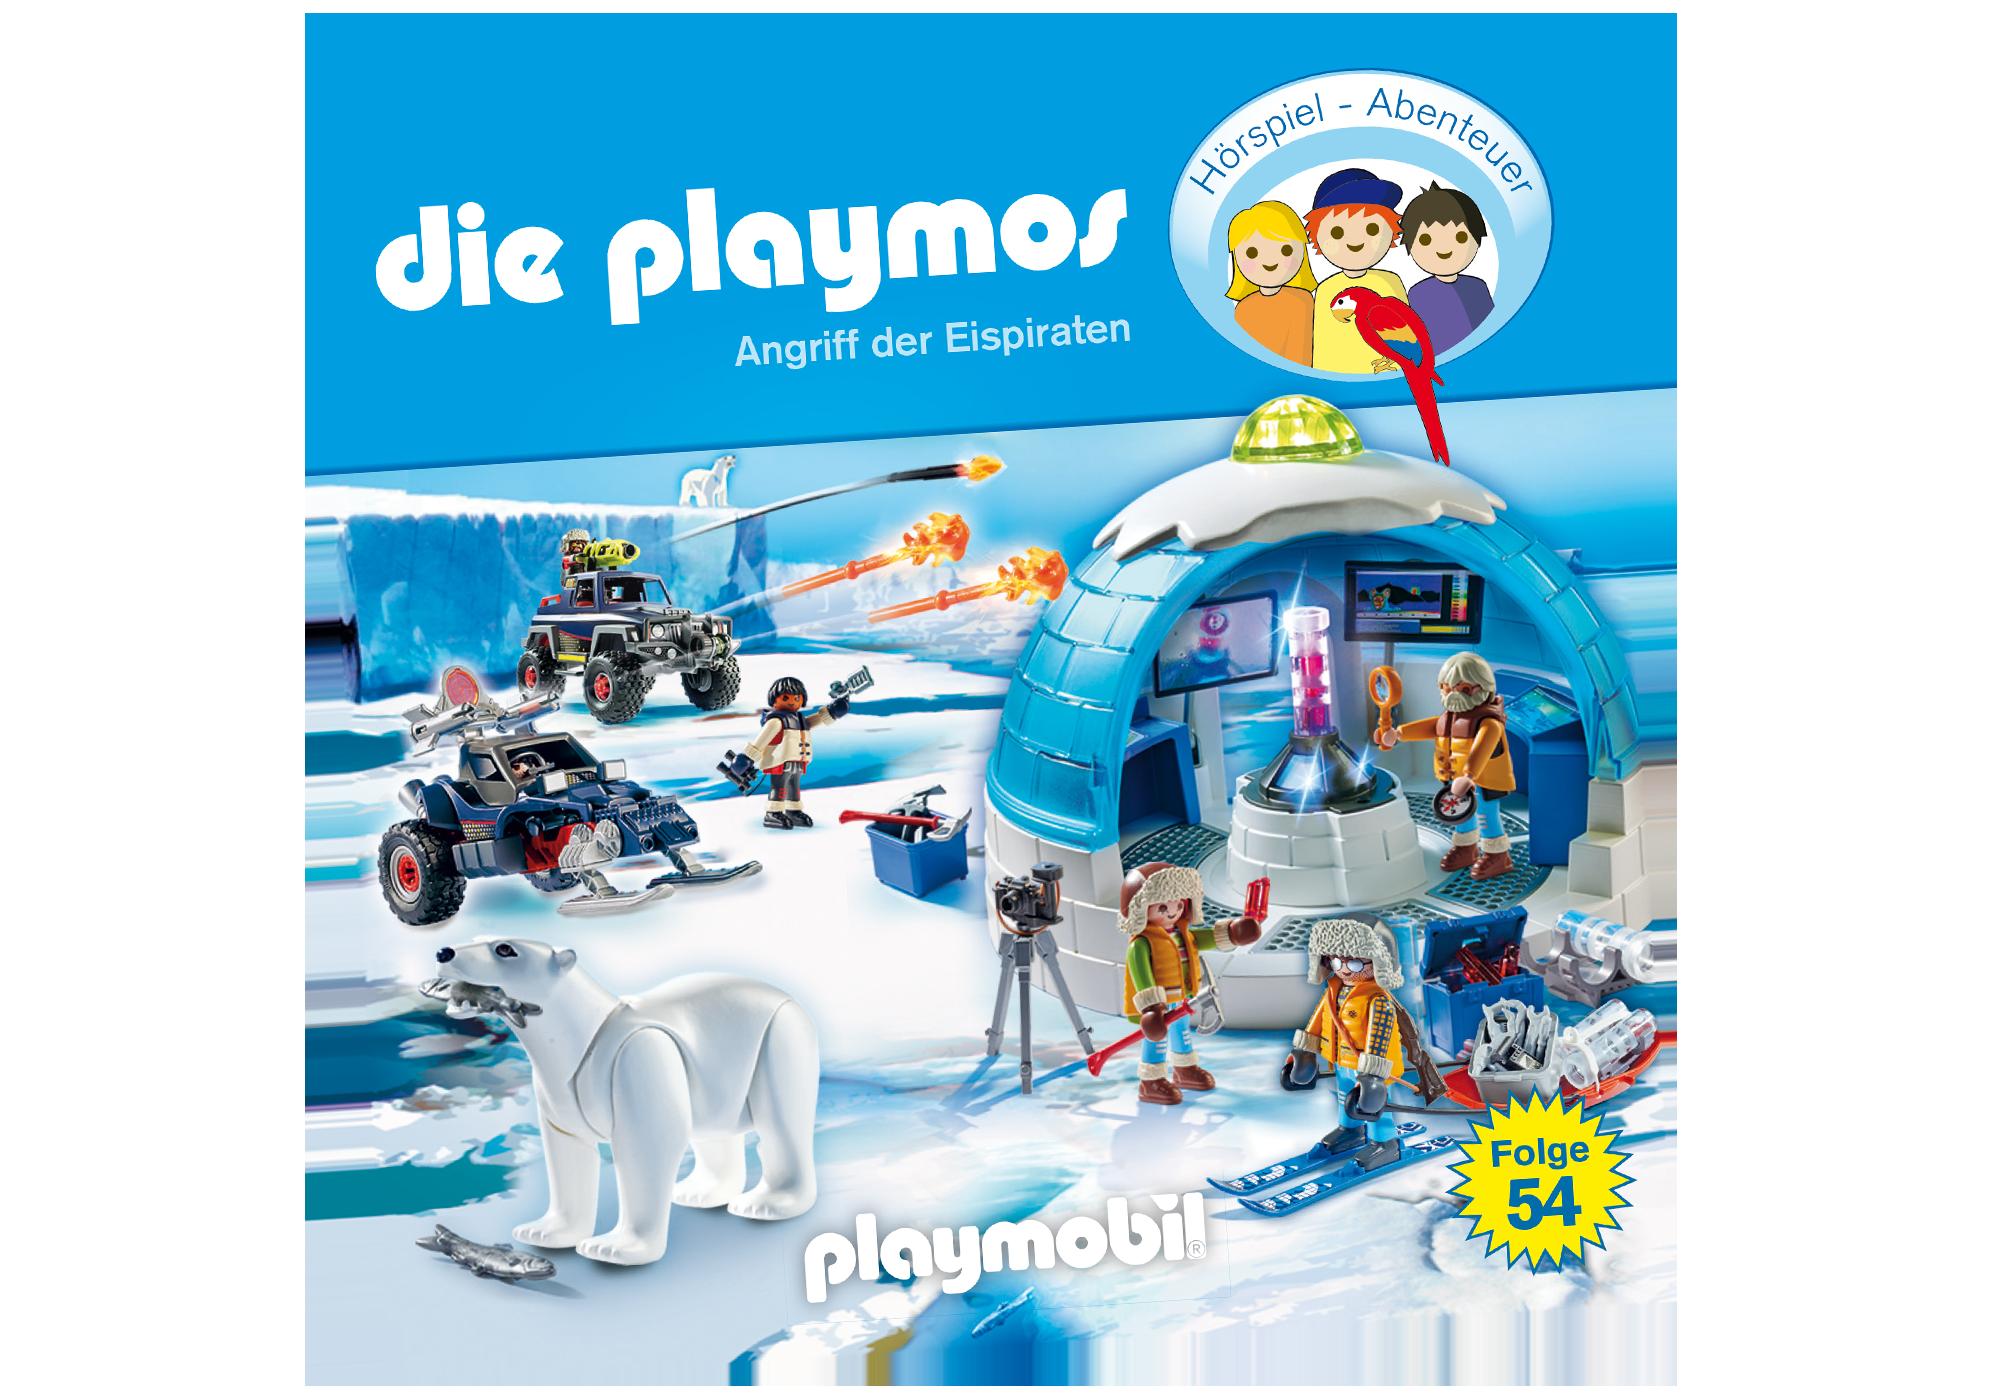 http://media.playmobil.com/i/playmobil/80483_product_detail